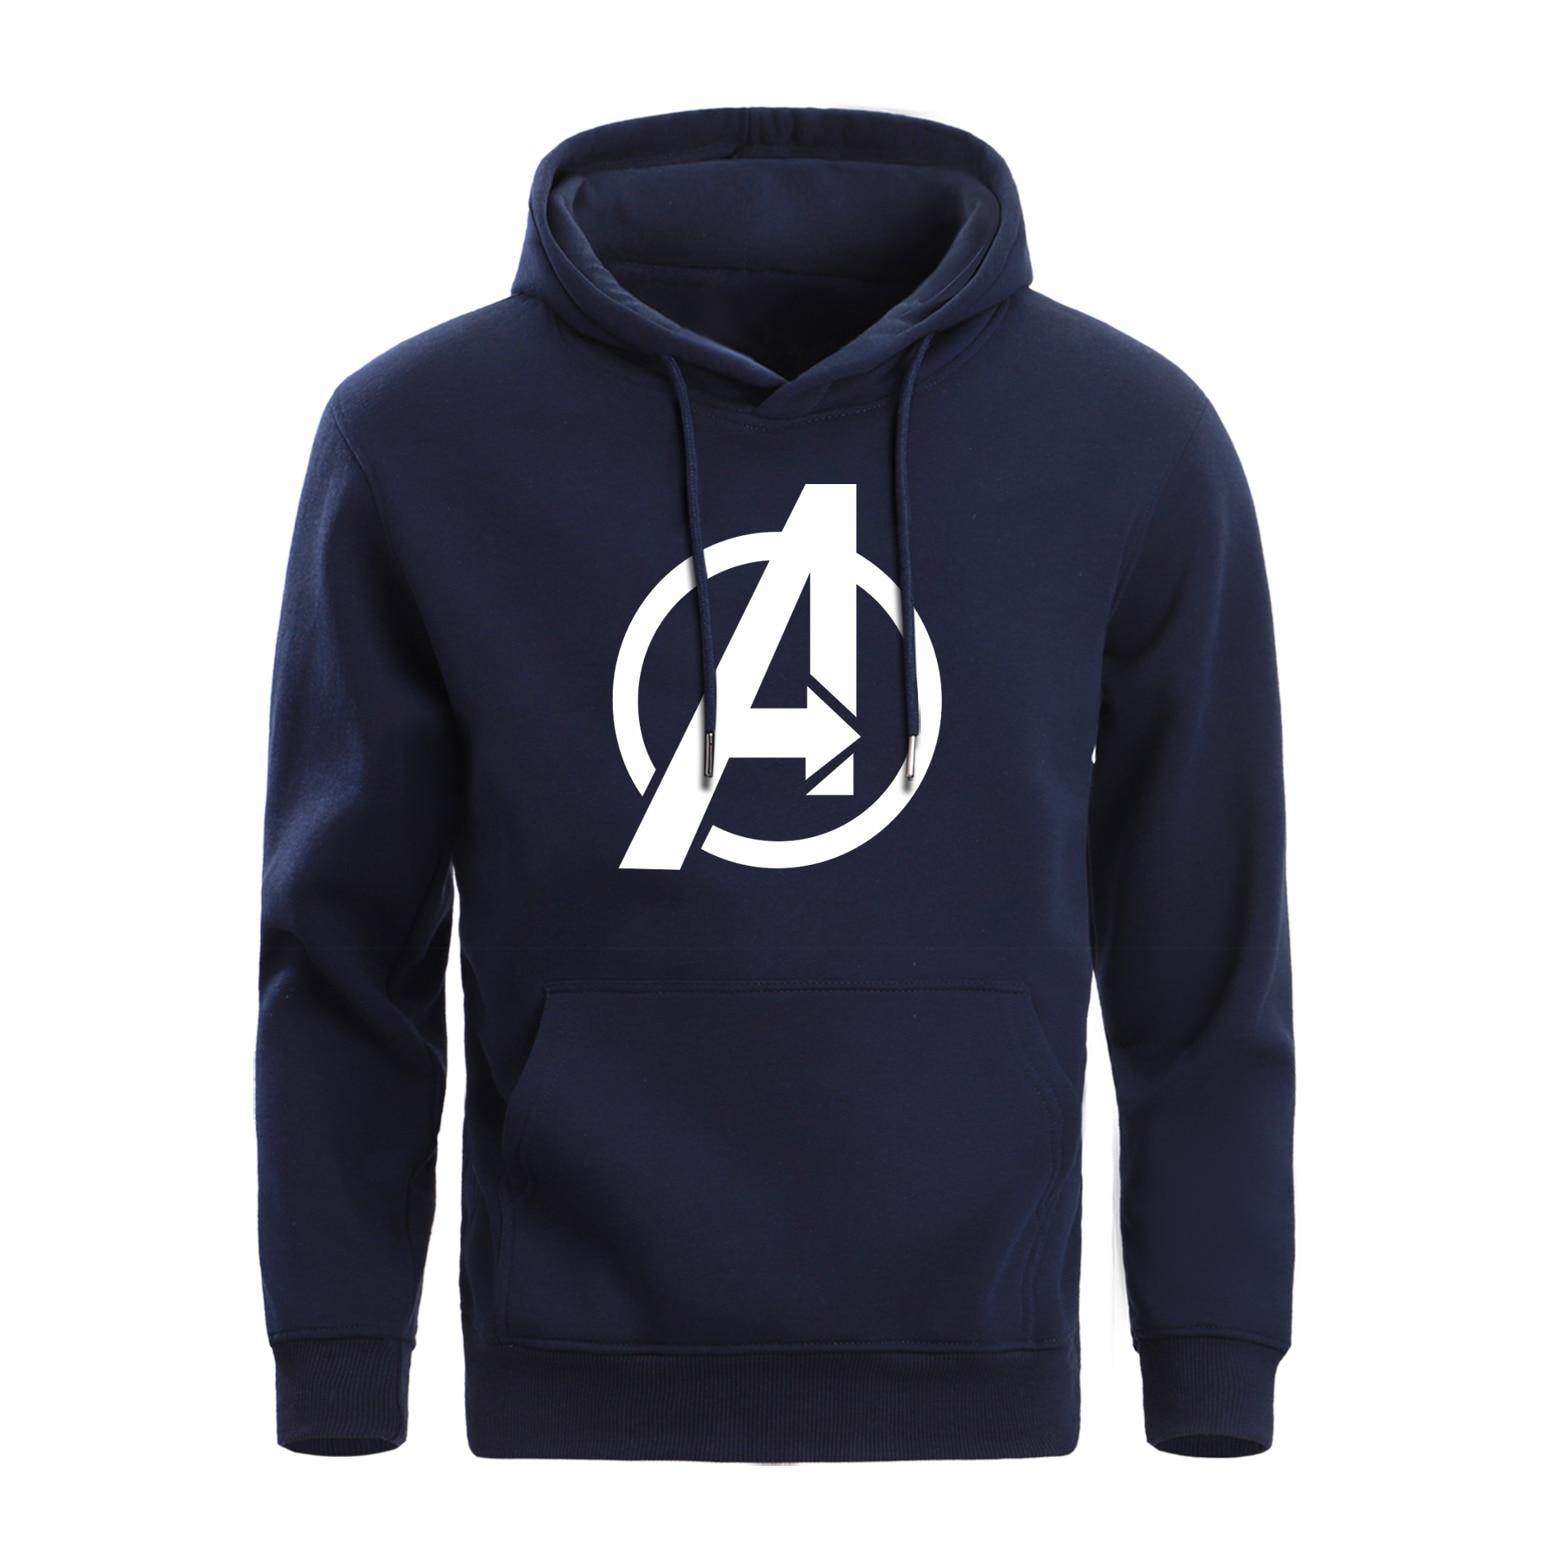 Men Avengers Hoodies Crewneck Marvel Hoodie Winter Fleece Warm Super Hero Sweatshirt Mens Pullover Hoody Sportswear Sweatshirts